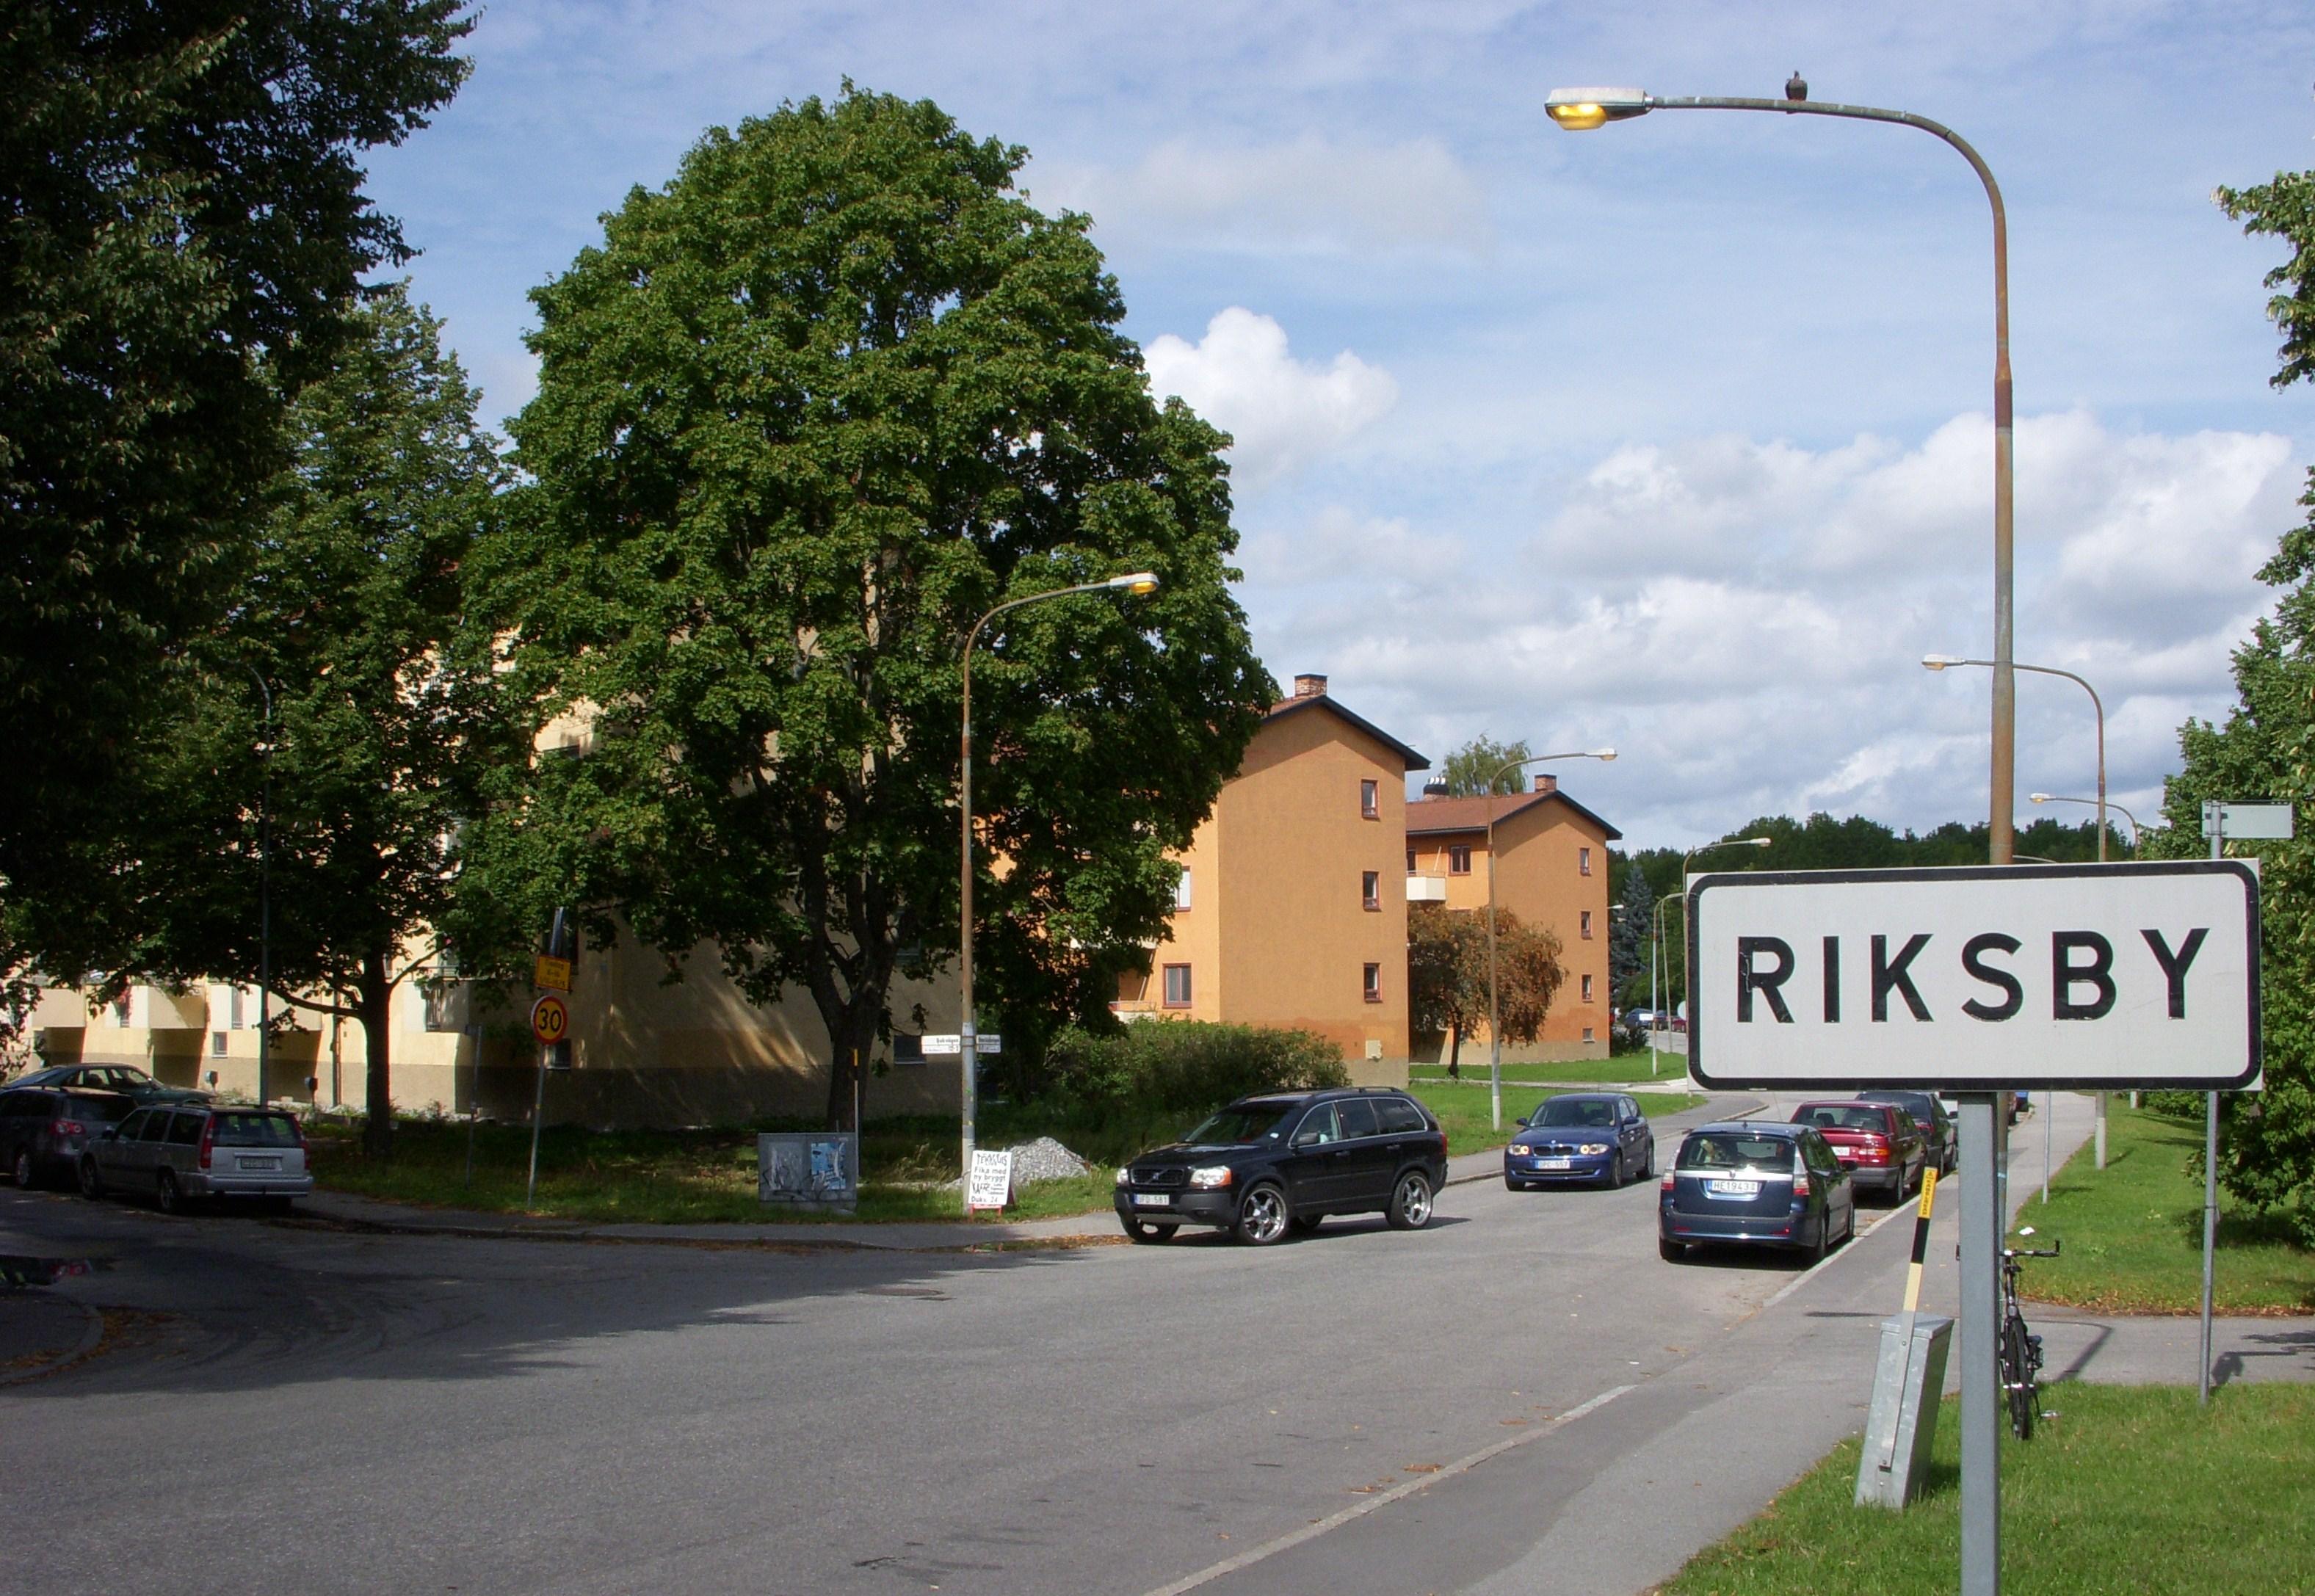 riksby